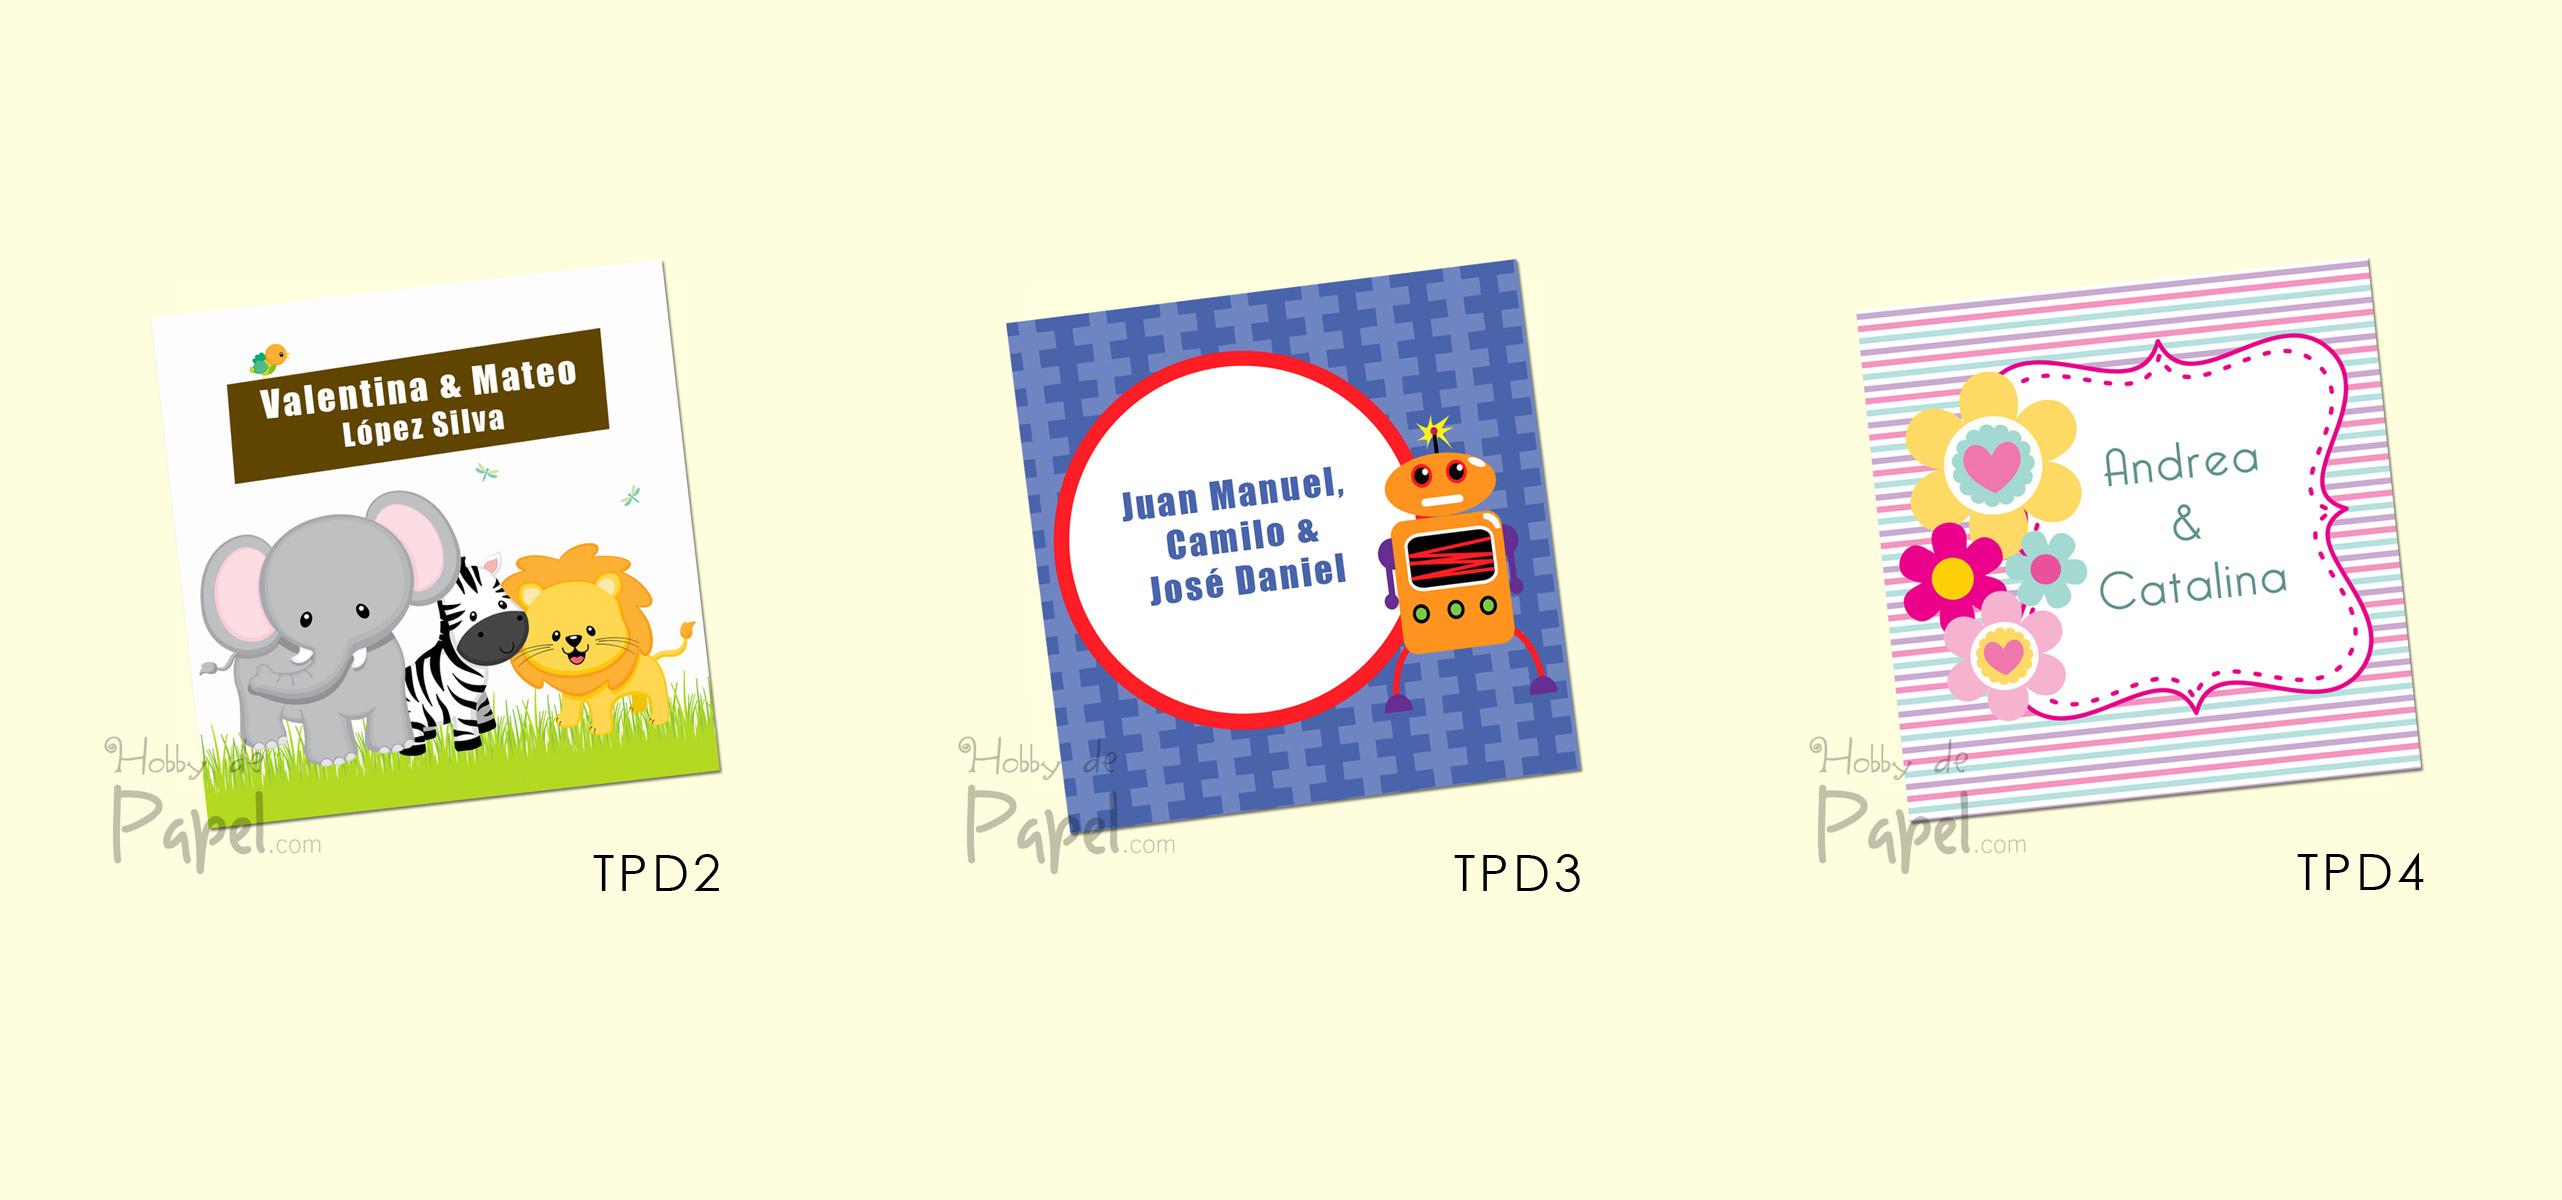 Disenos De Tarjetas Personales Infantiles Imagui